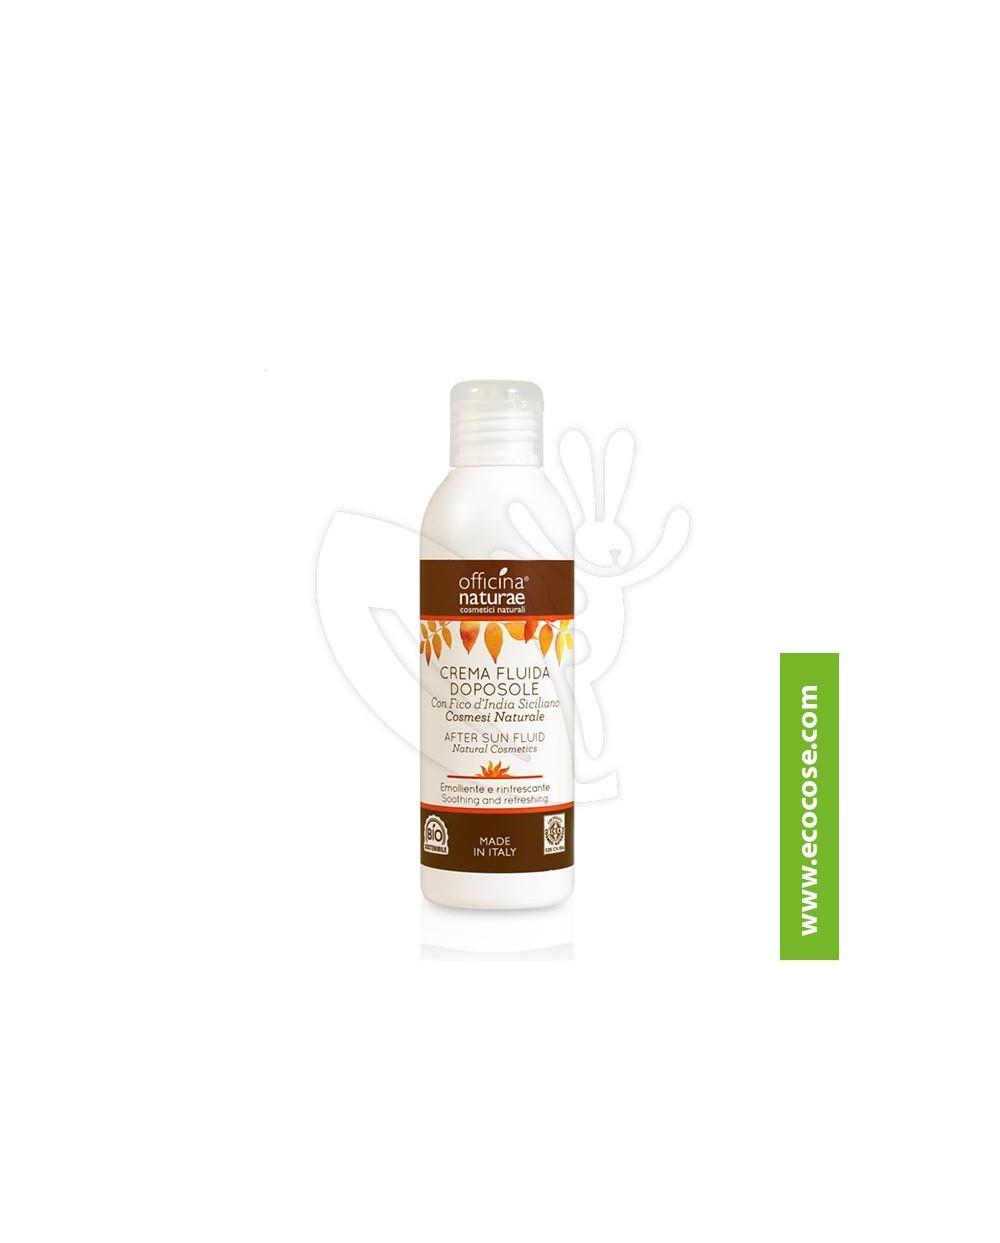 Officina Naturae - Crema fluida Doposole